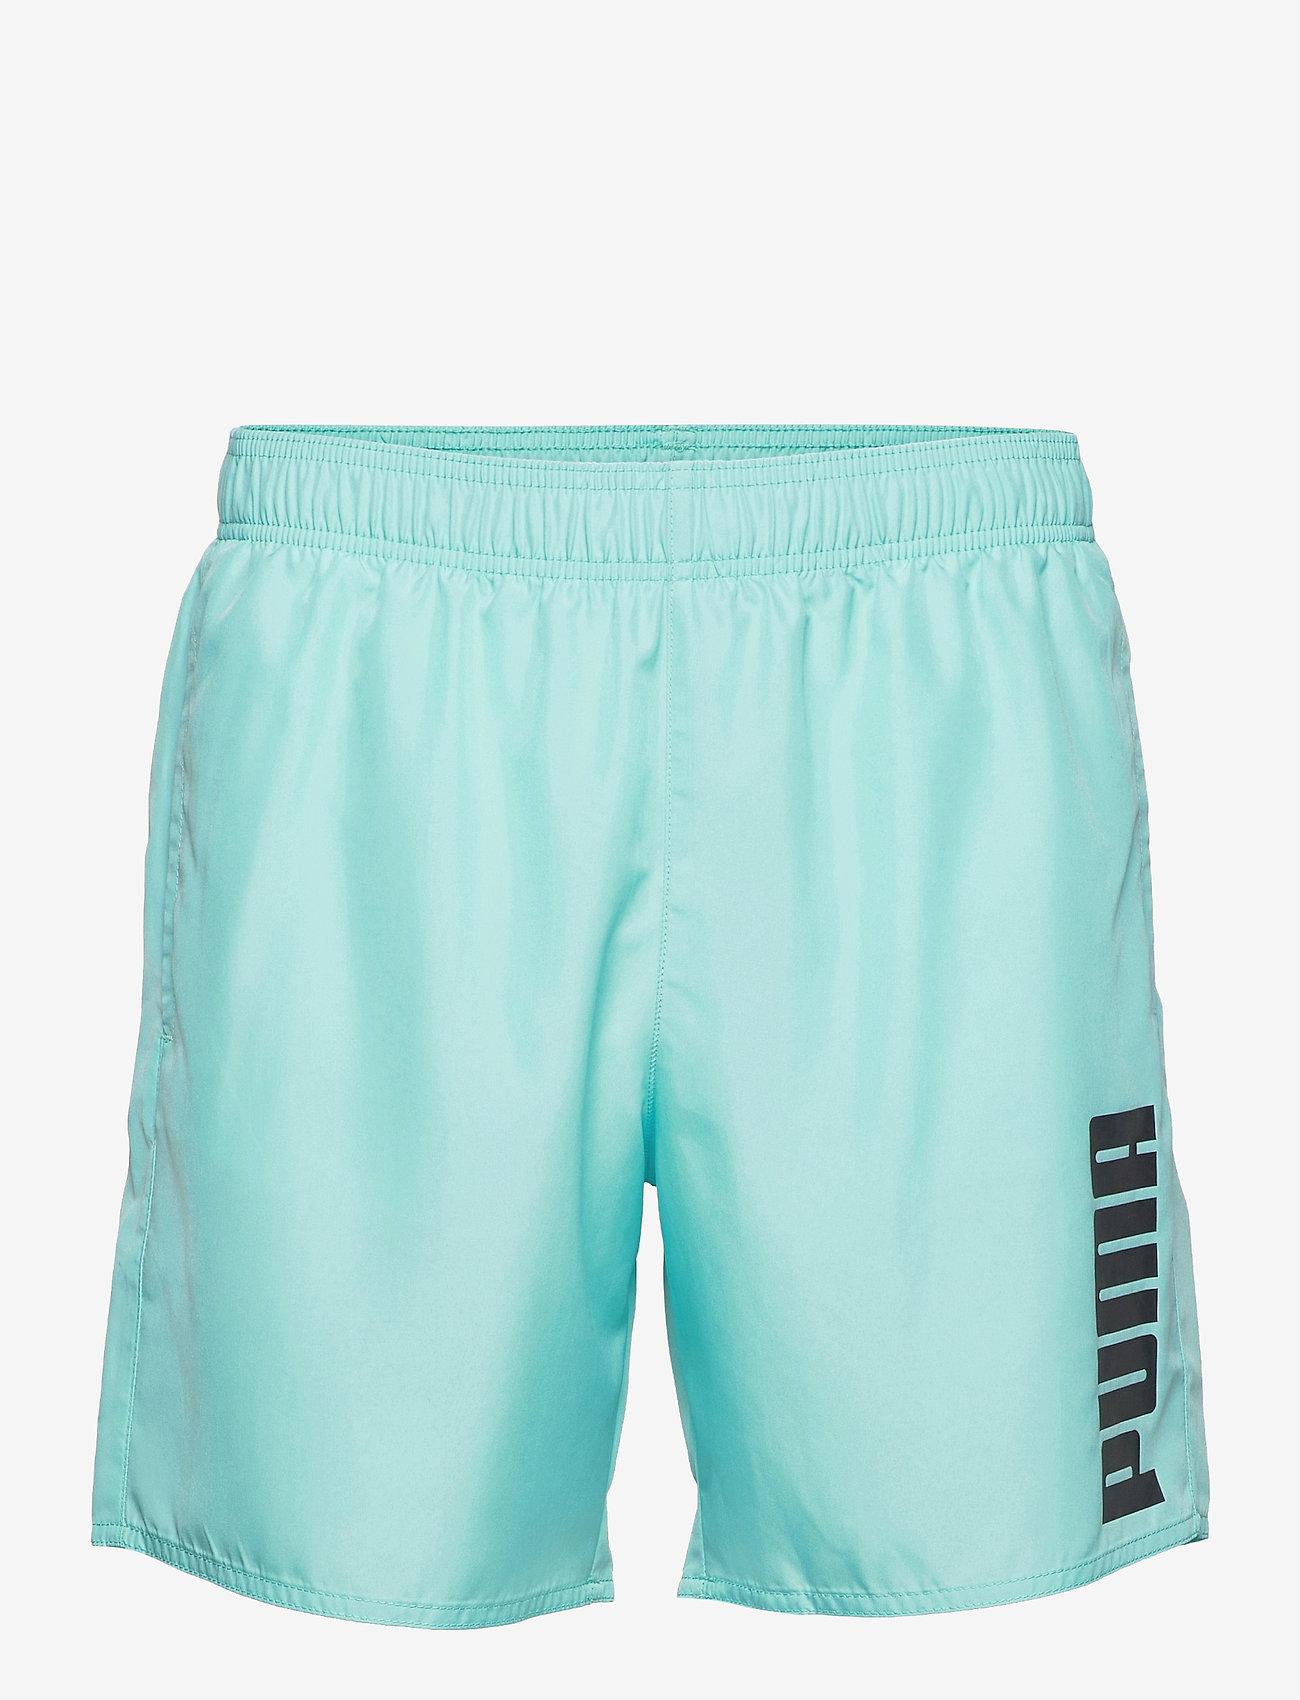 Puma Swim - PUMA SWIM MEN MID SHORTS 1P - badbyxor - angel blue - 0